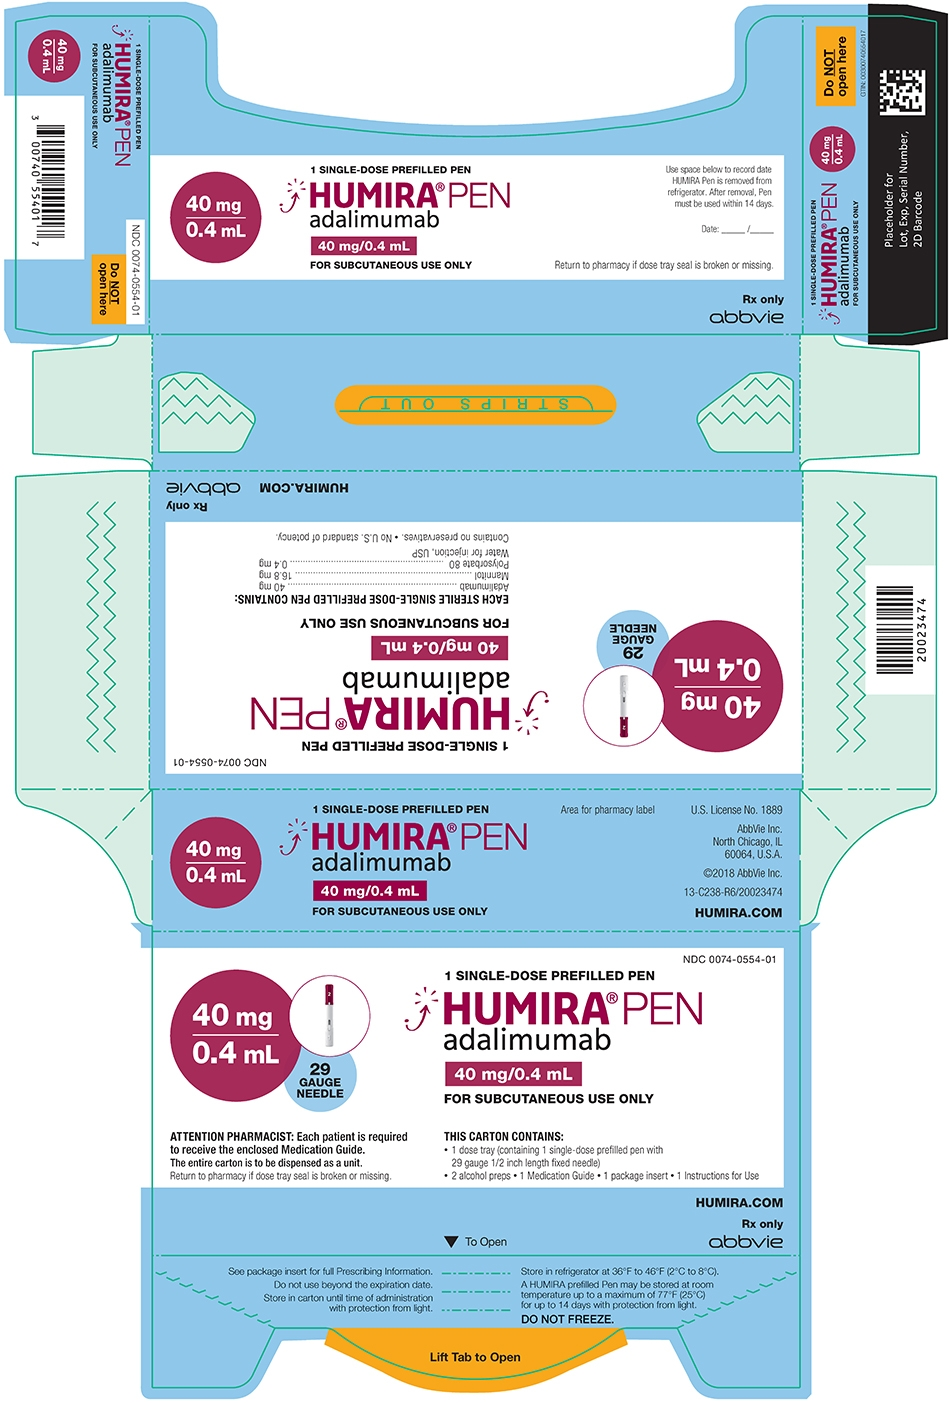 carton-humira-pen-mai-40mg4ml-1ct